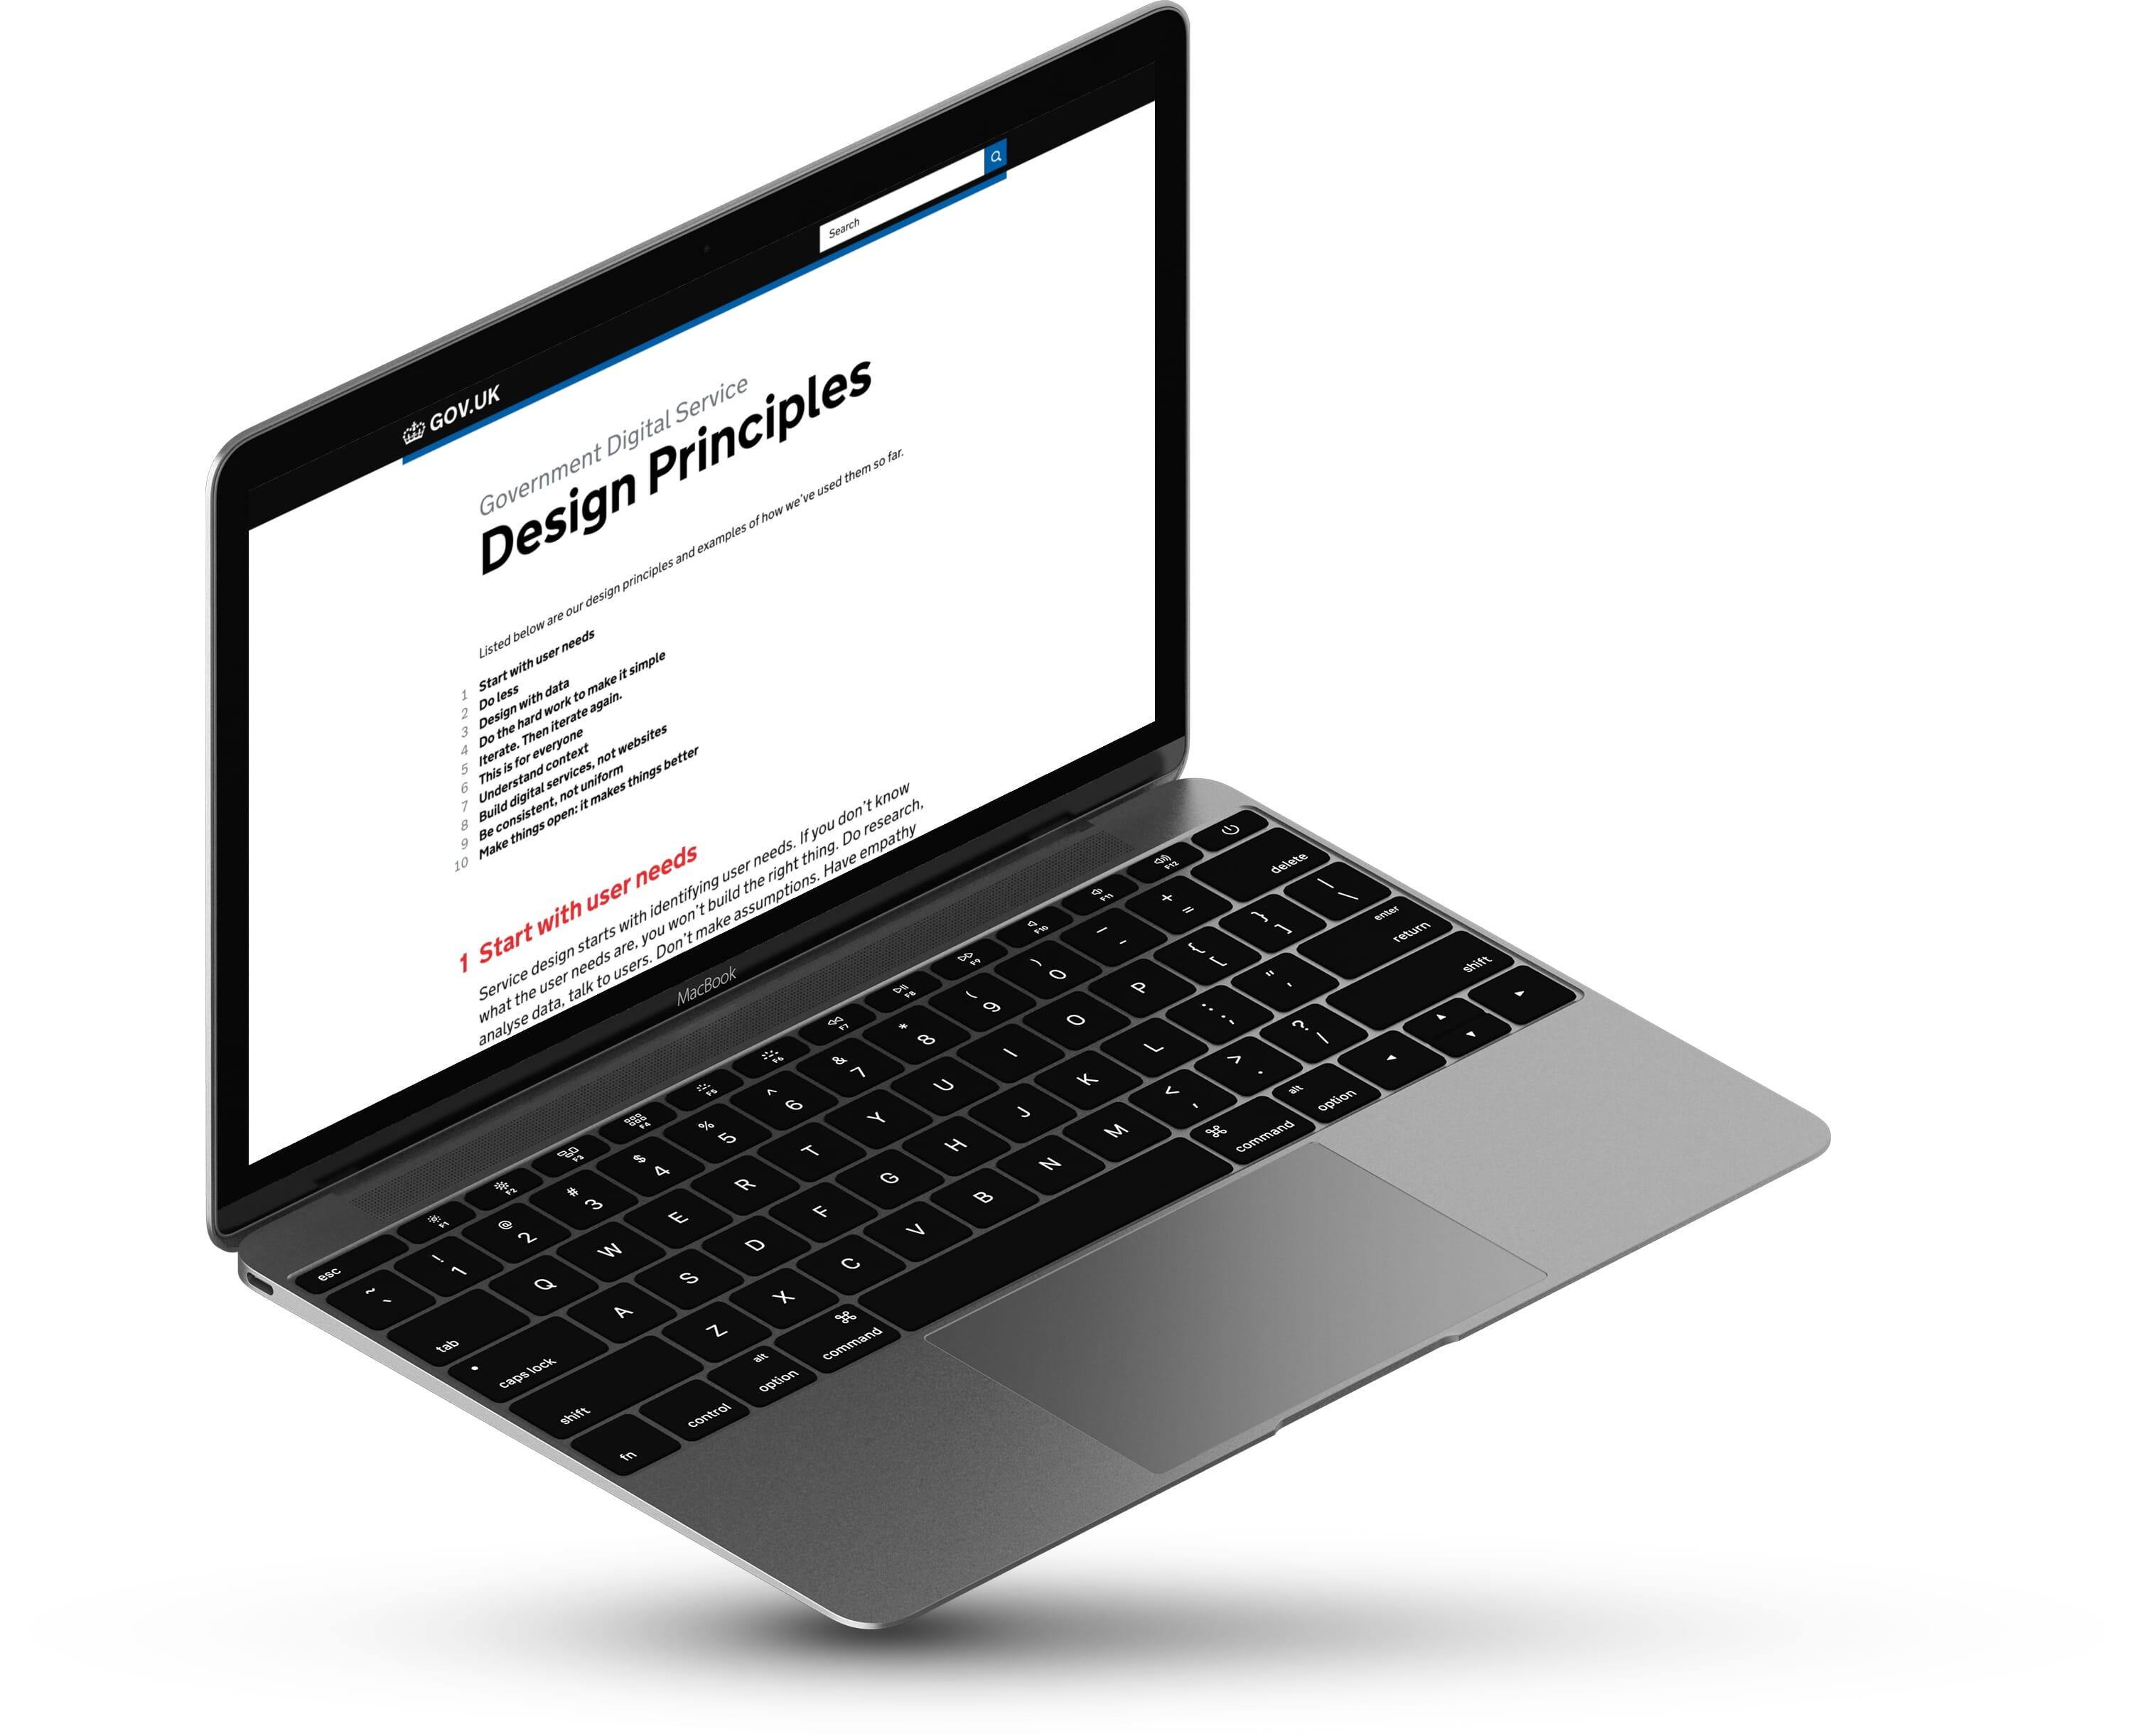 Laptop showing design principles